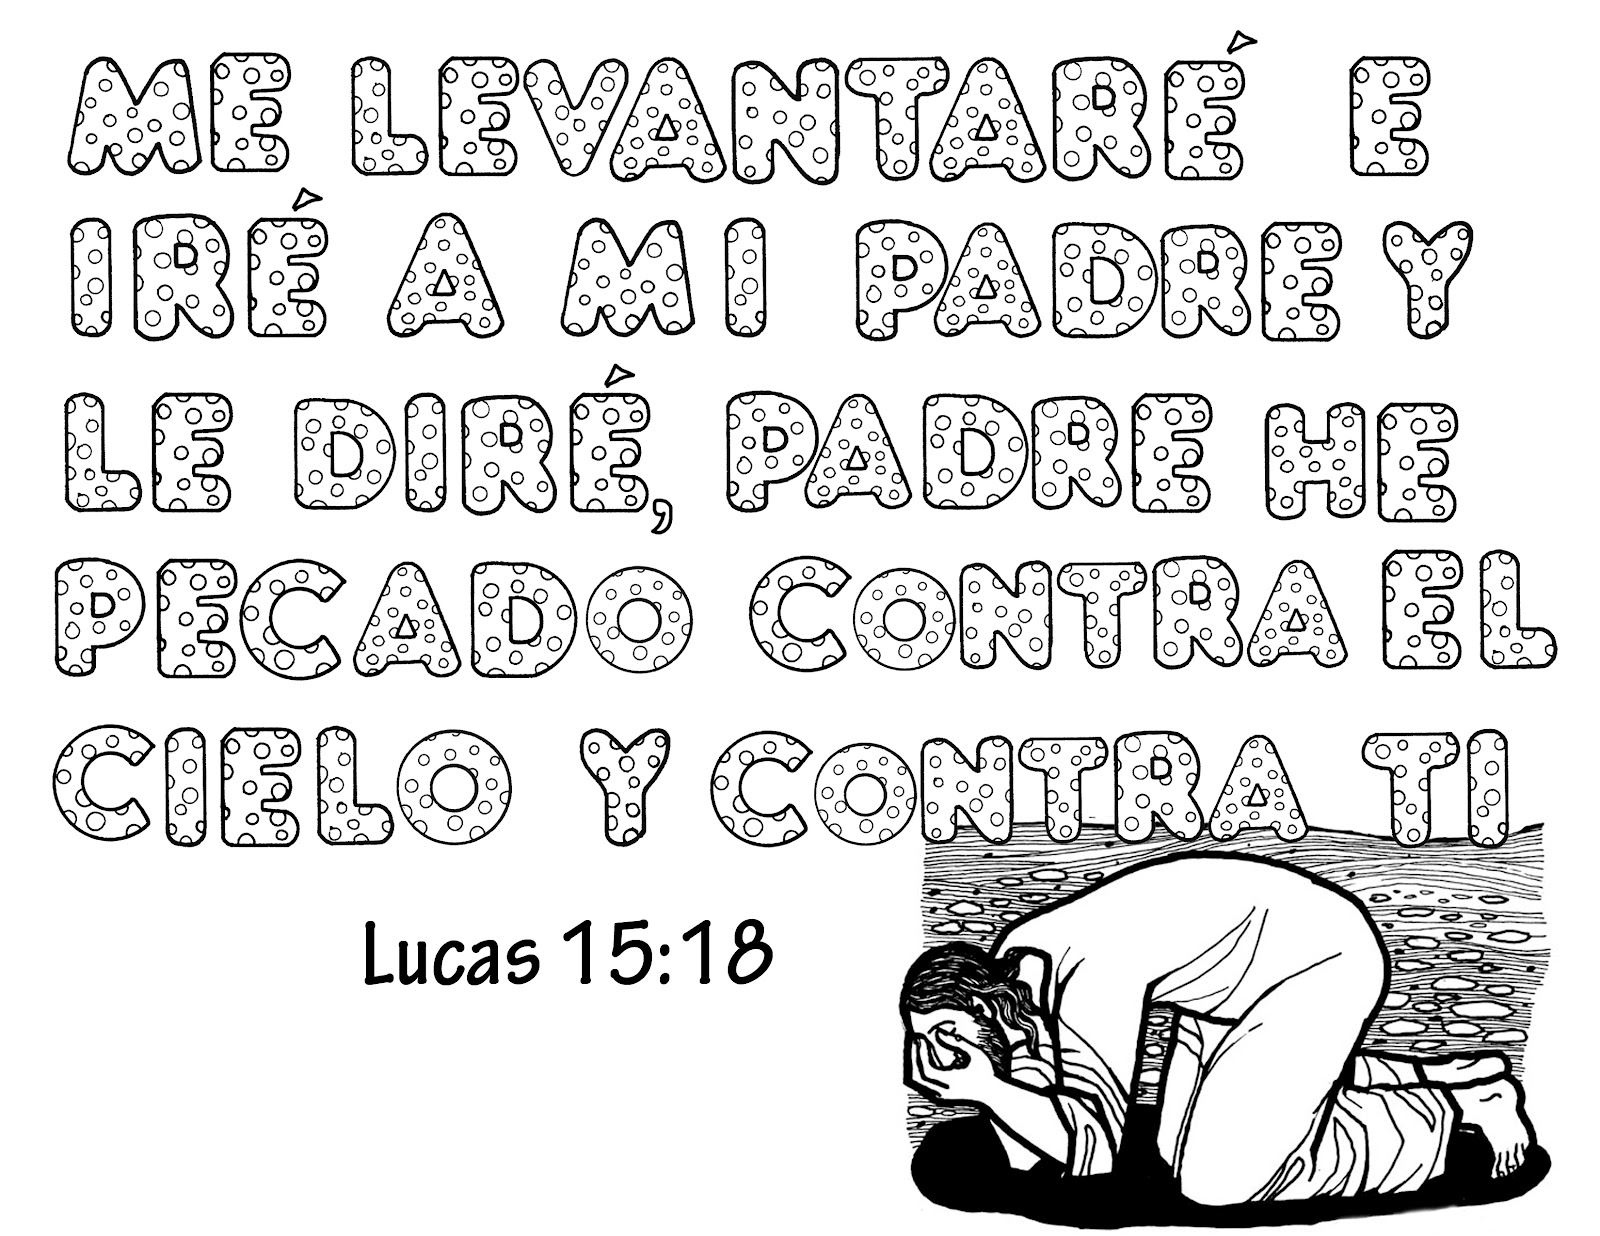 Dibujos De La Biblia Para Colorear E Imprimir: TEXTOS BIBLICOS PARA COLOREAR CON DIBUJO